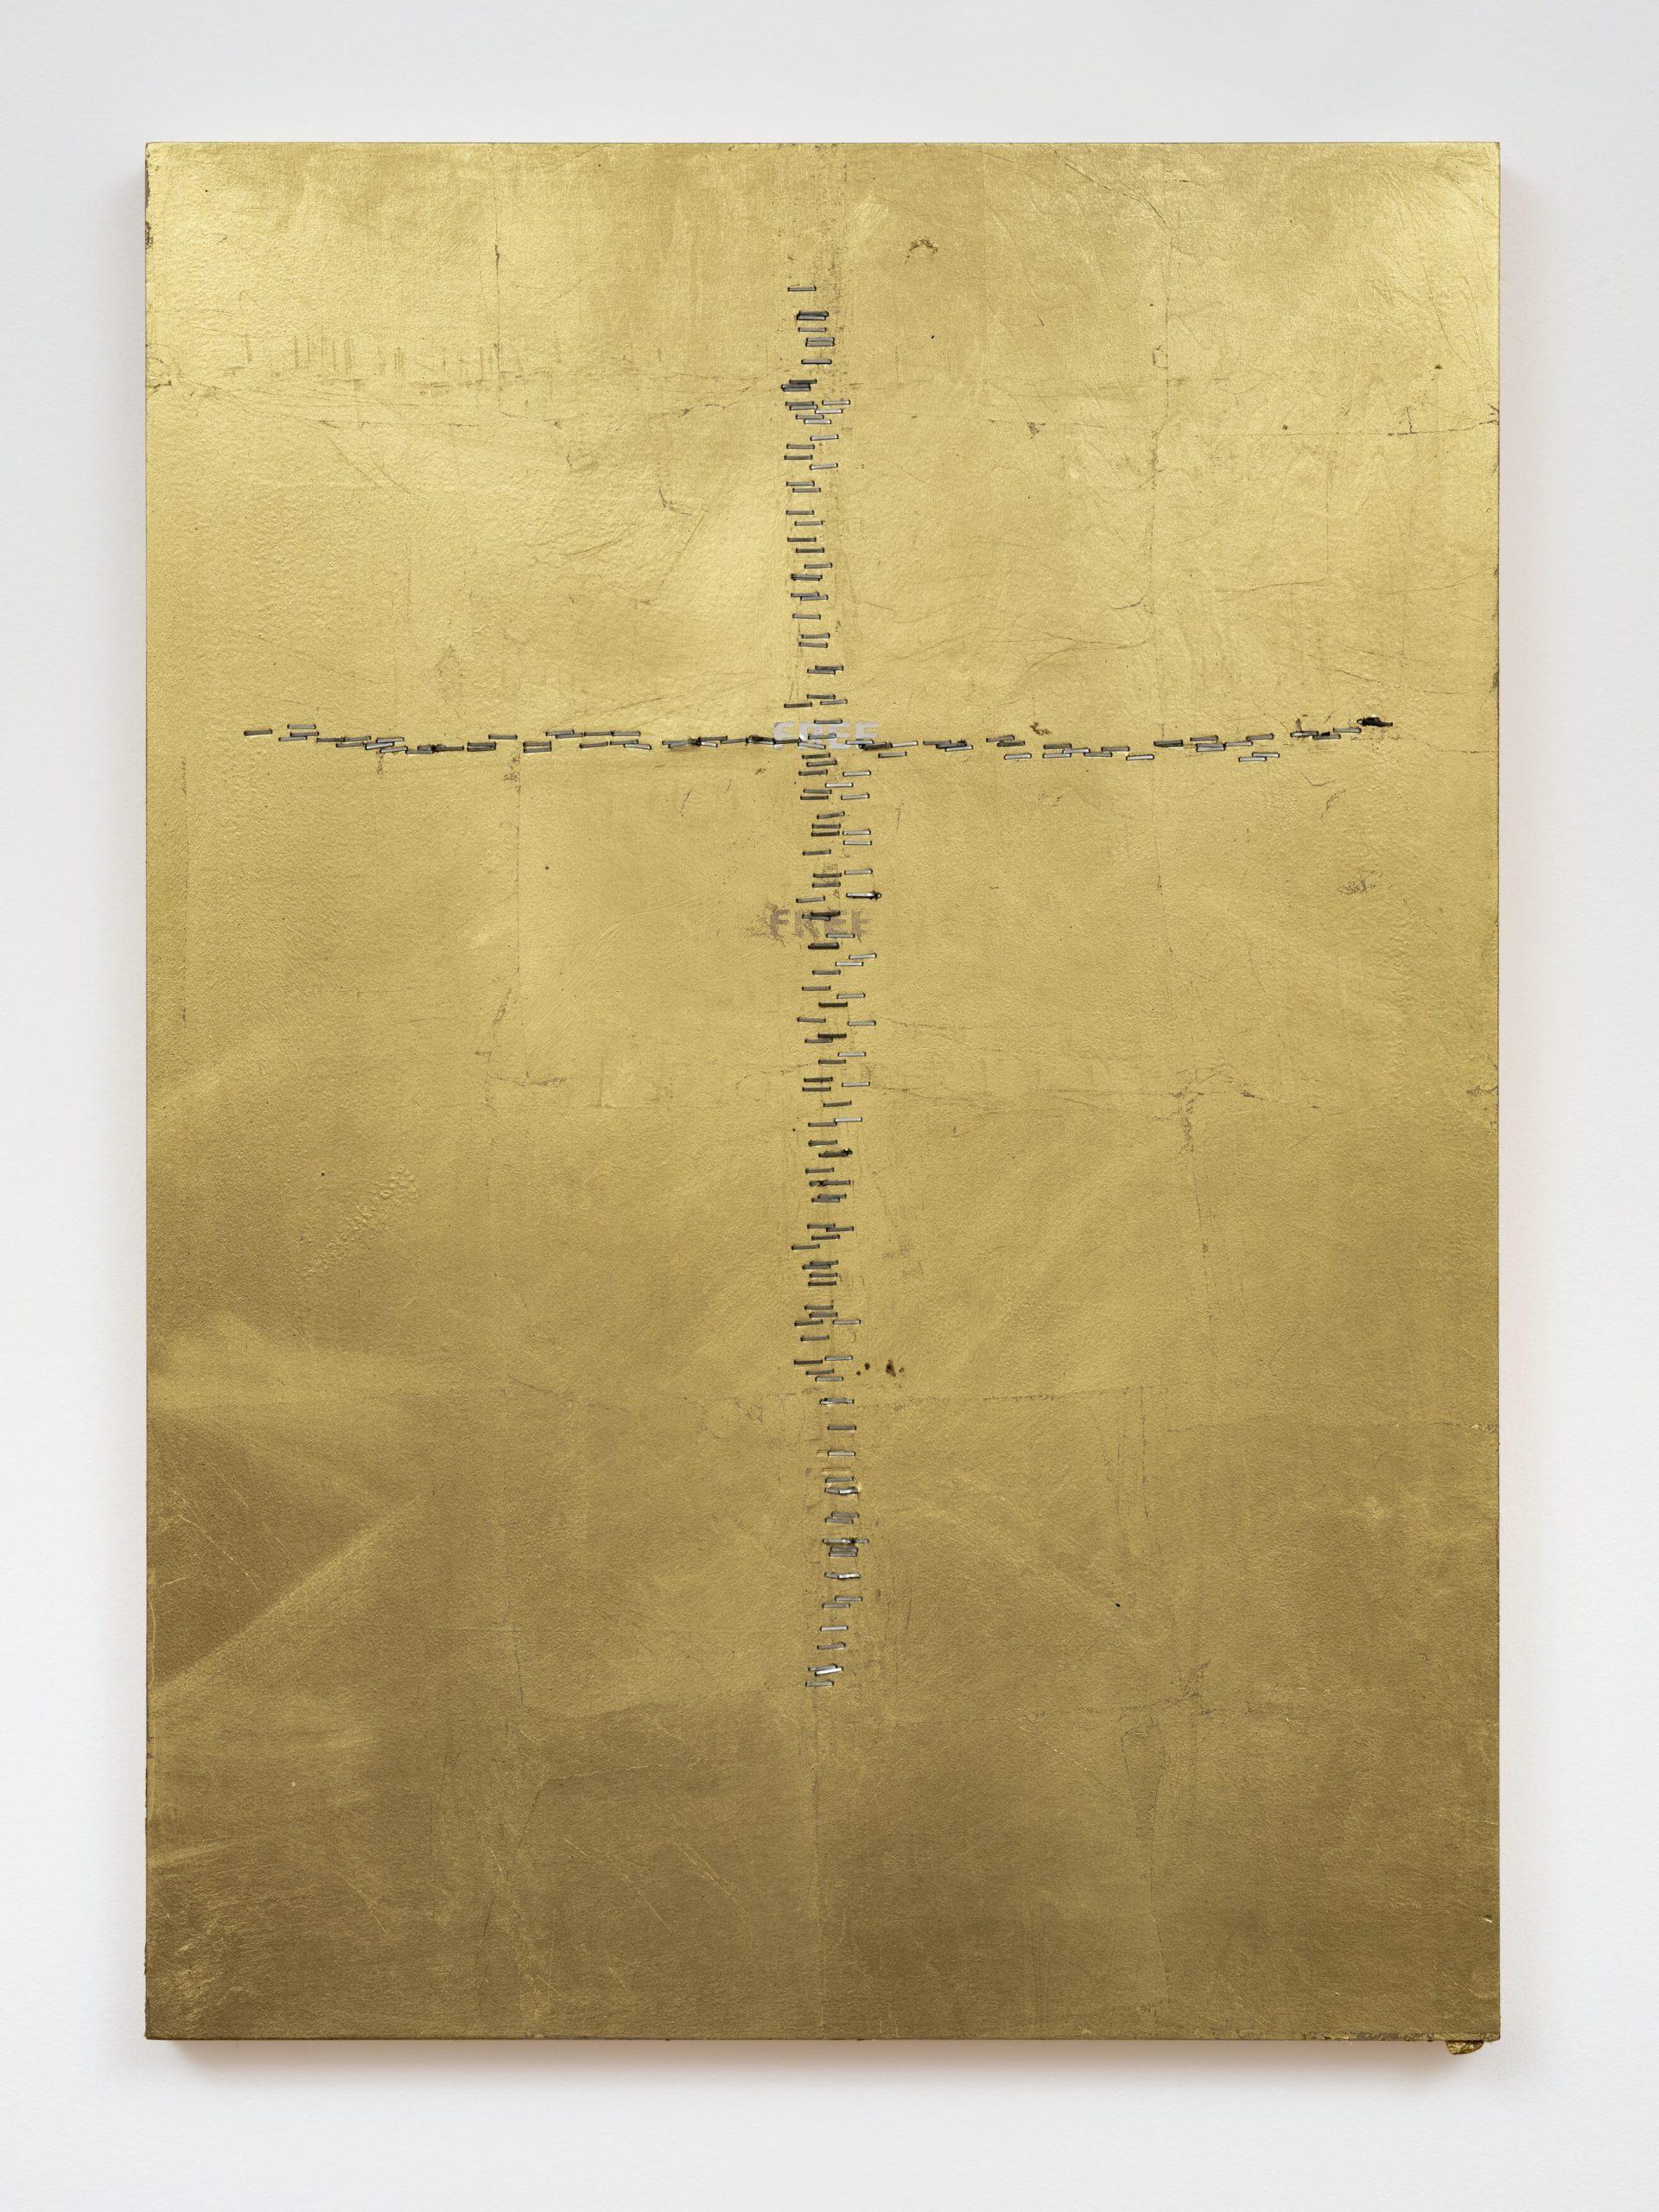 Stefan Brüggemann INSIDE (HYPER-POEM LOCKDOWN) 2020 Gold leaf, metal staples and vinyl text on wood 70 x 49.7 x 3.5 cm / 27 1/2 x 19 5/8 x 1 3/8,  © Stefan Brüggemann Courtesy the artist and Hauser & Wirth Photo: Damian Griffiths